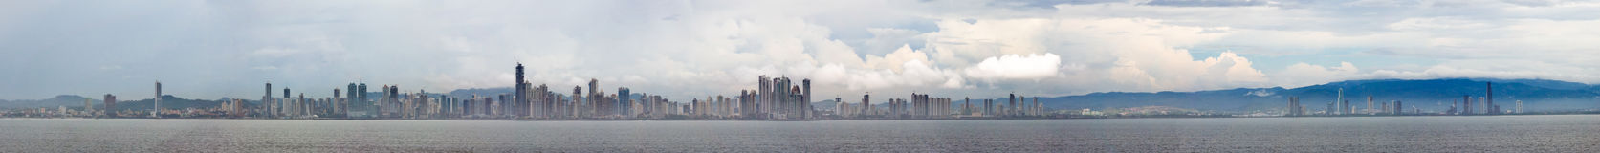 Panama City panorámico foto de archivo